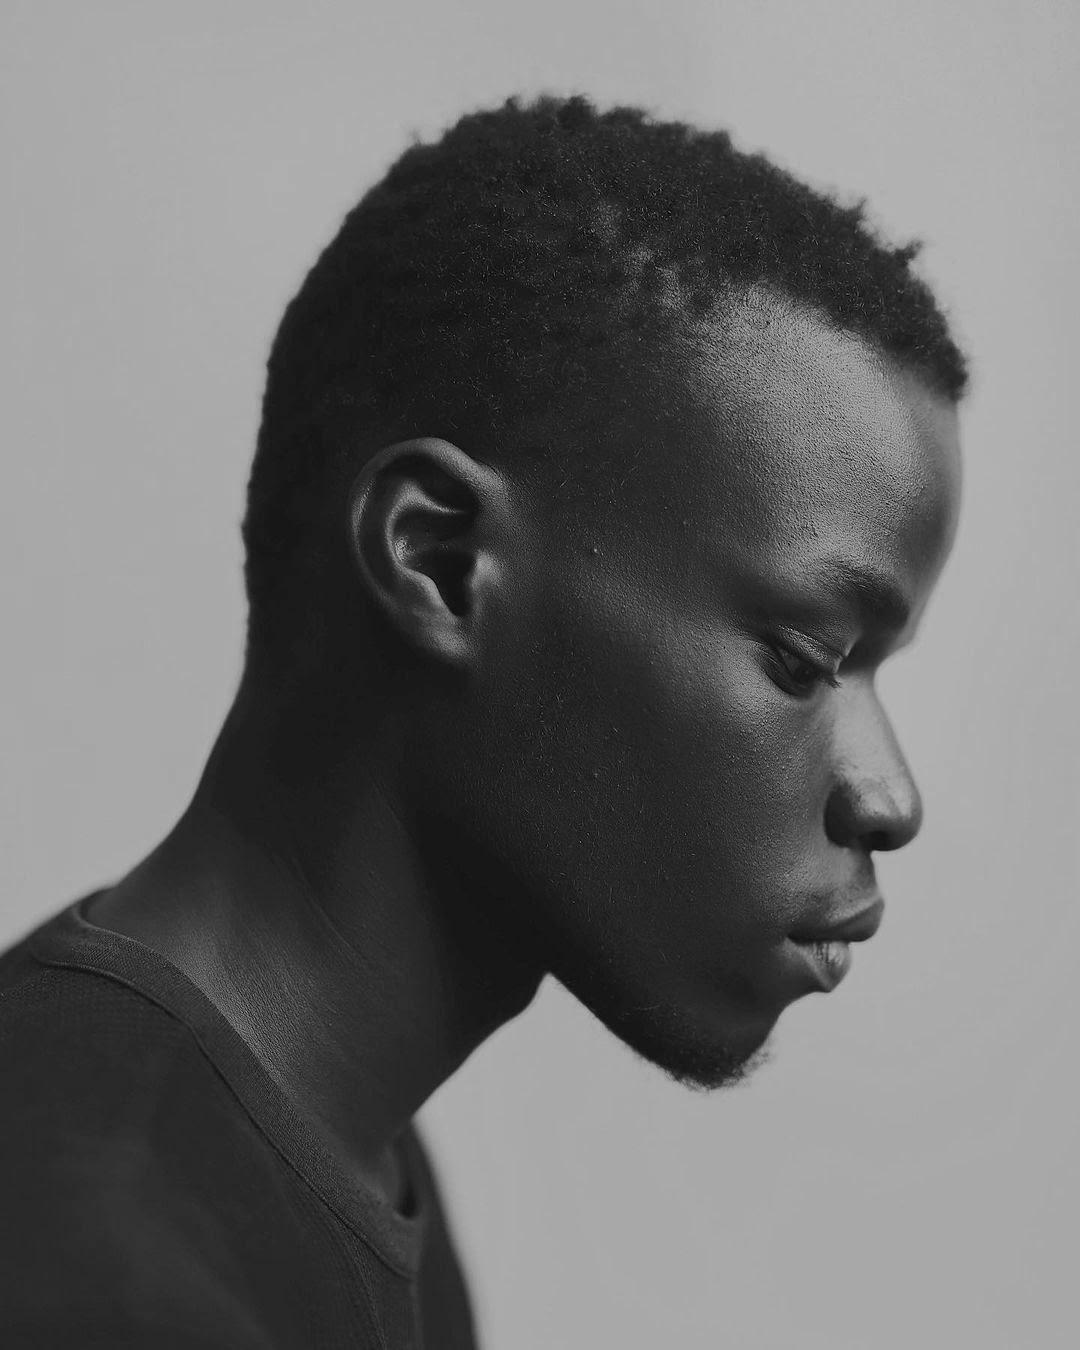 ÓniX, by David Cardona ft Abdou